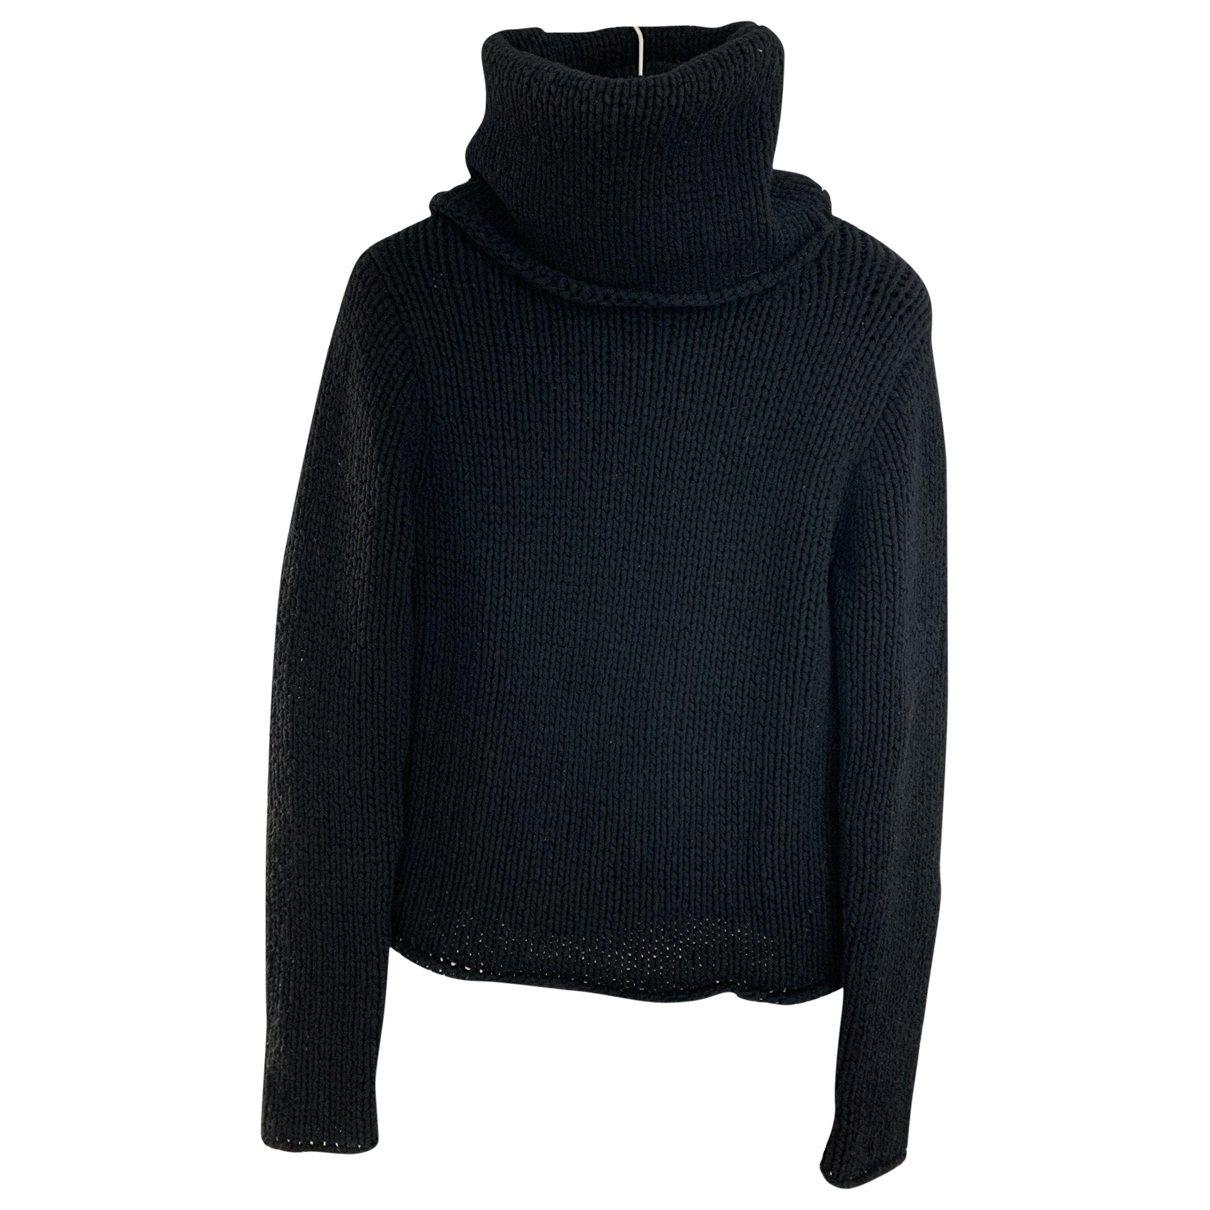 Dkny \N Pullover in  Schwarz Wolle